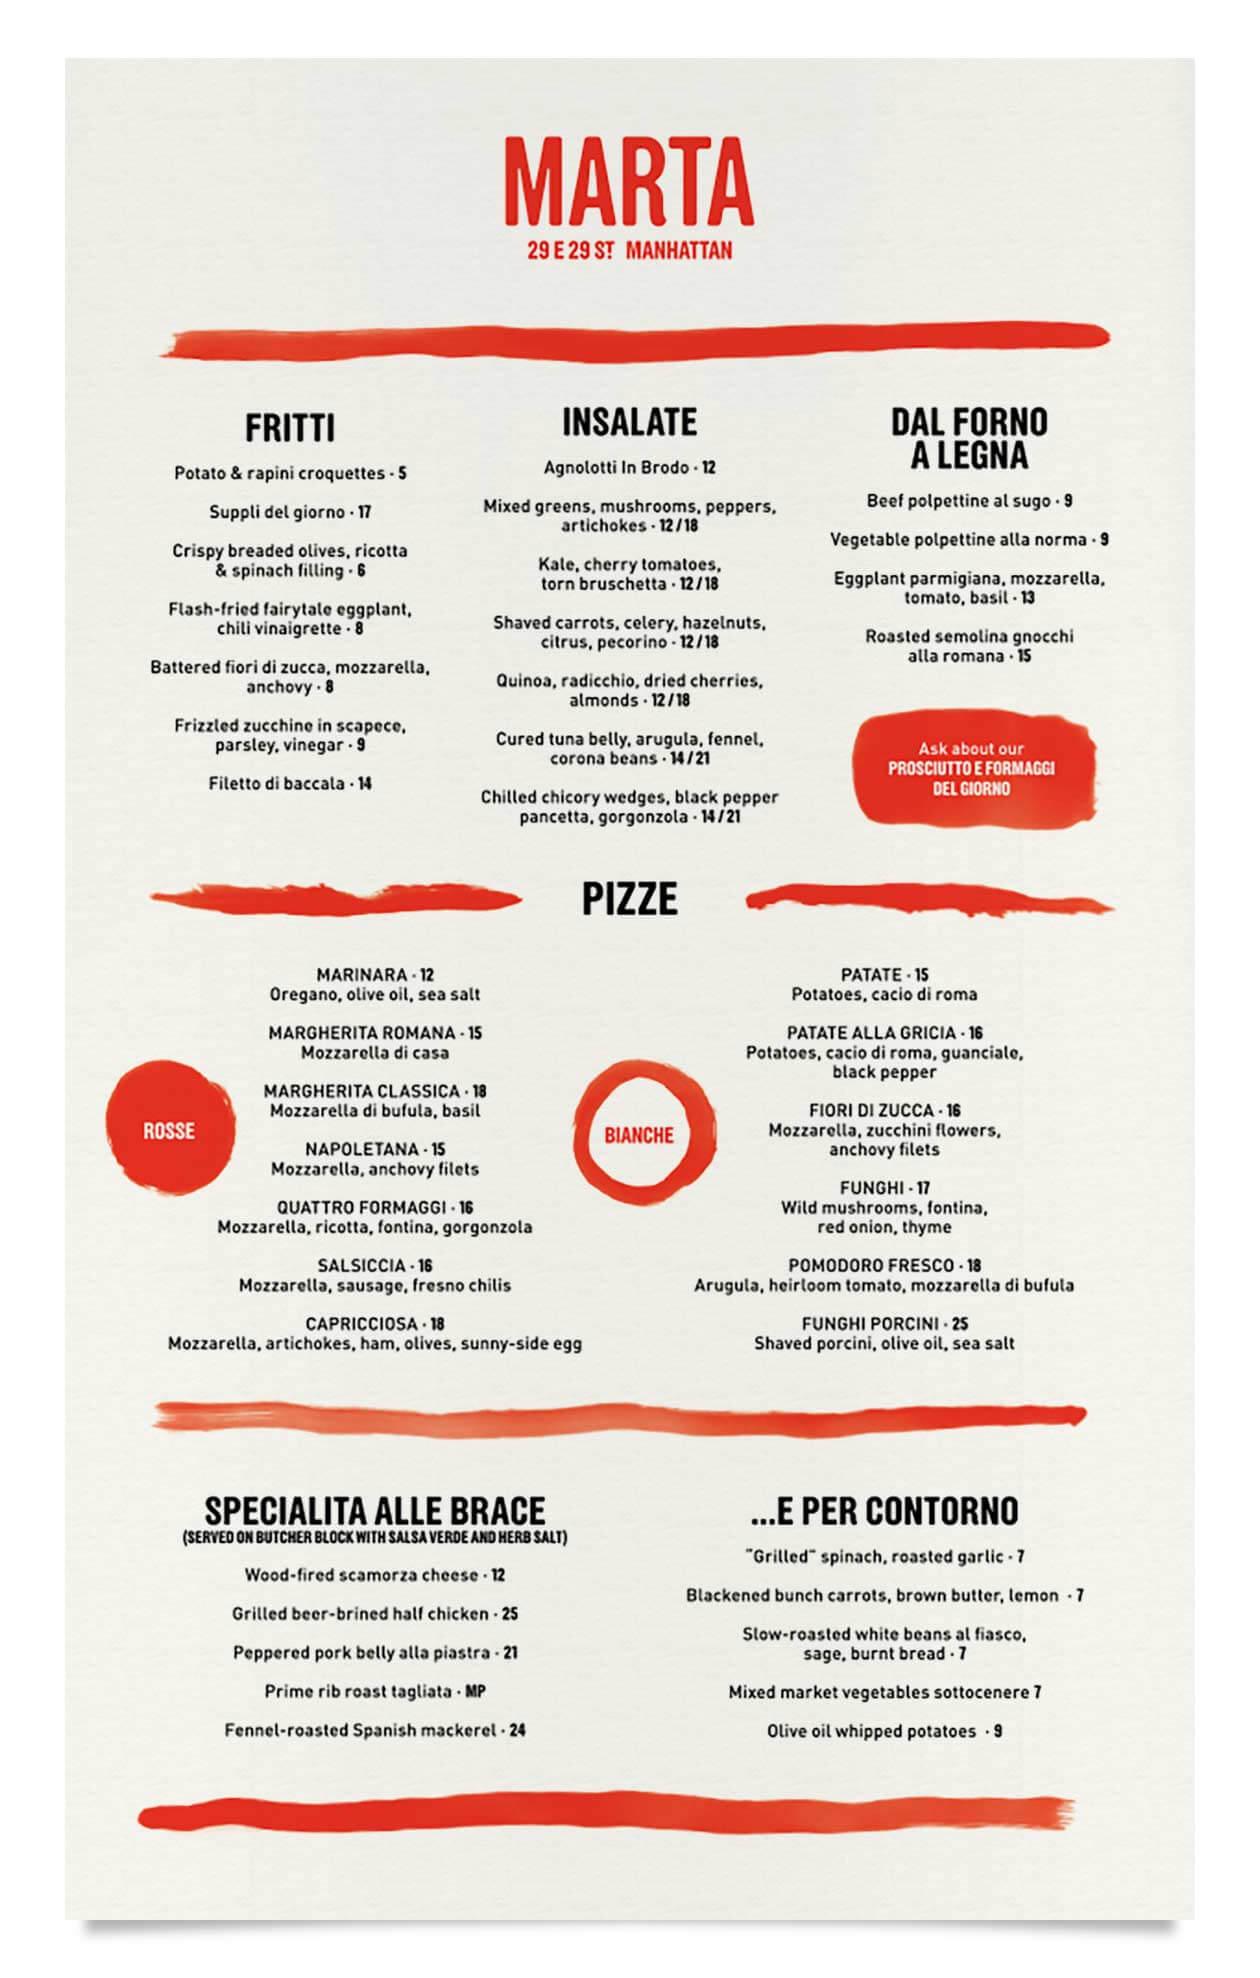 marta-menu-1